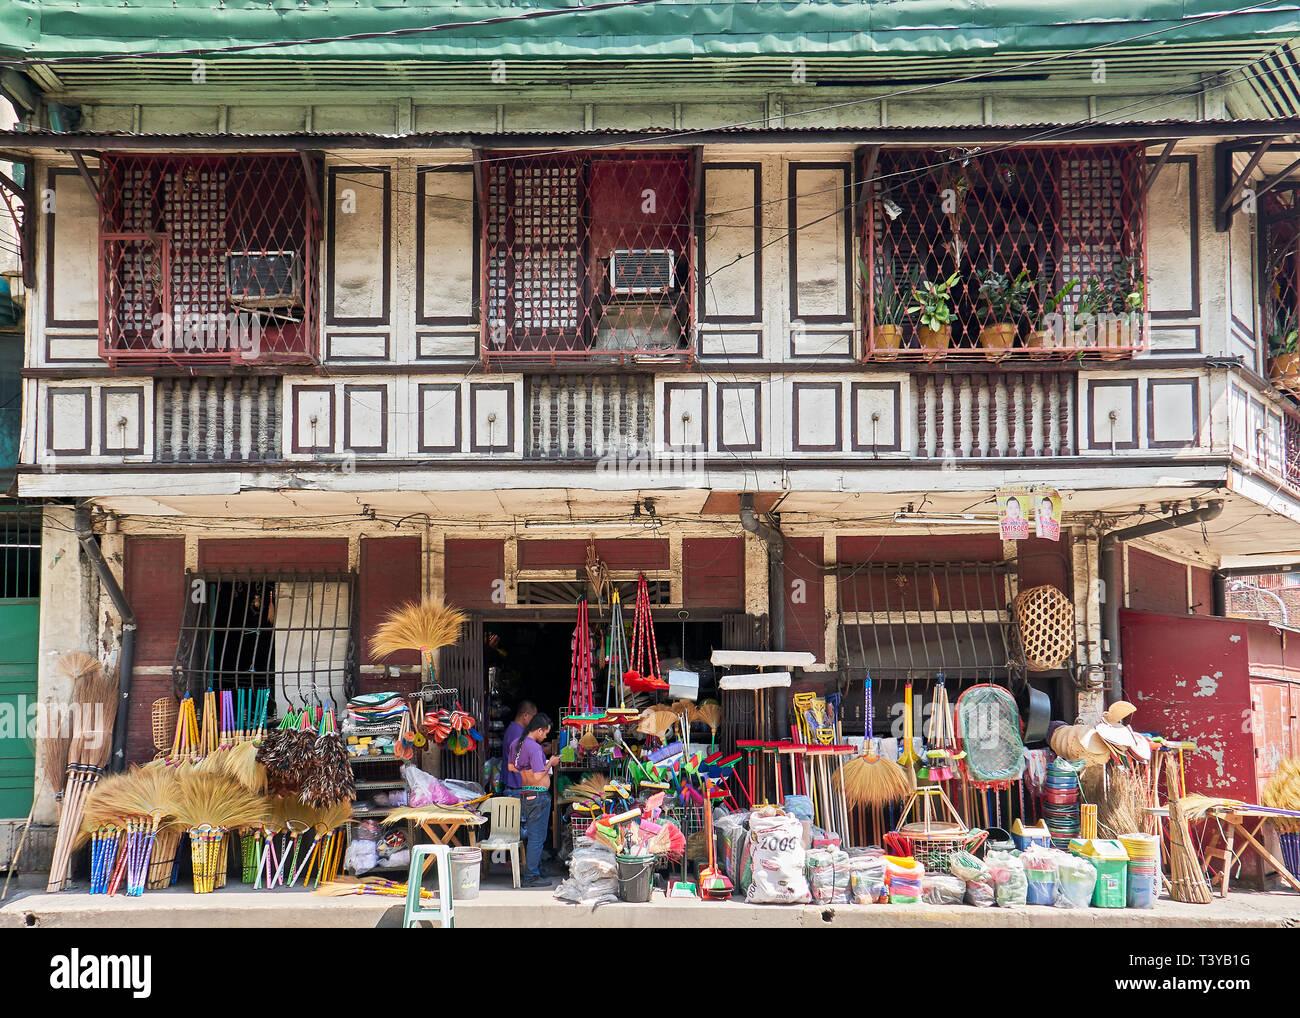 Manila, Philippines: Facade of an old historical wooden building with a shop, Binondo, near the Pasig River, Manila - Stock Image